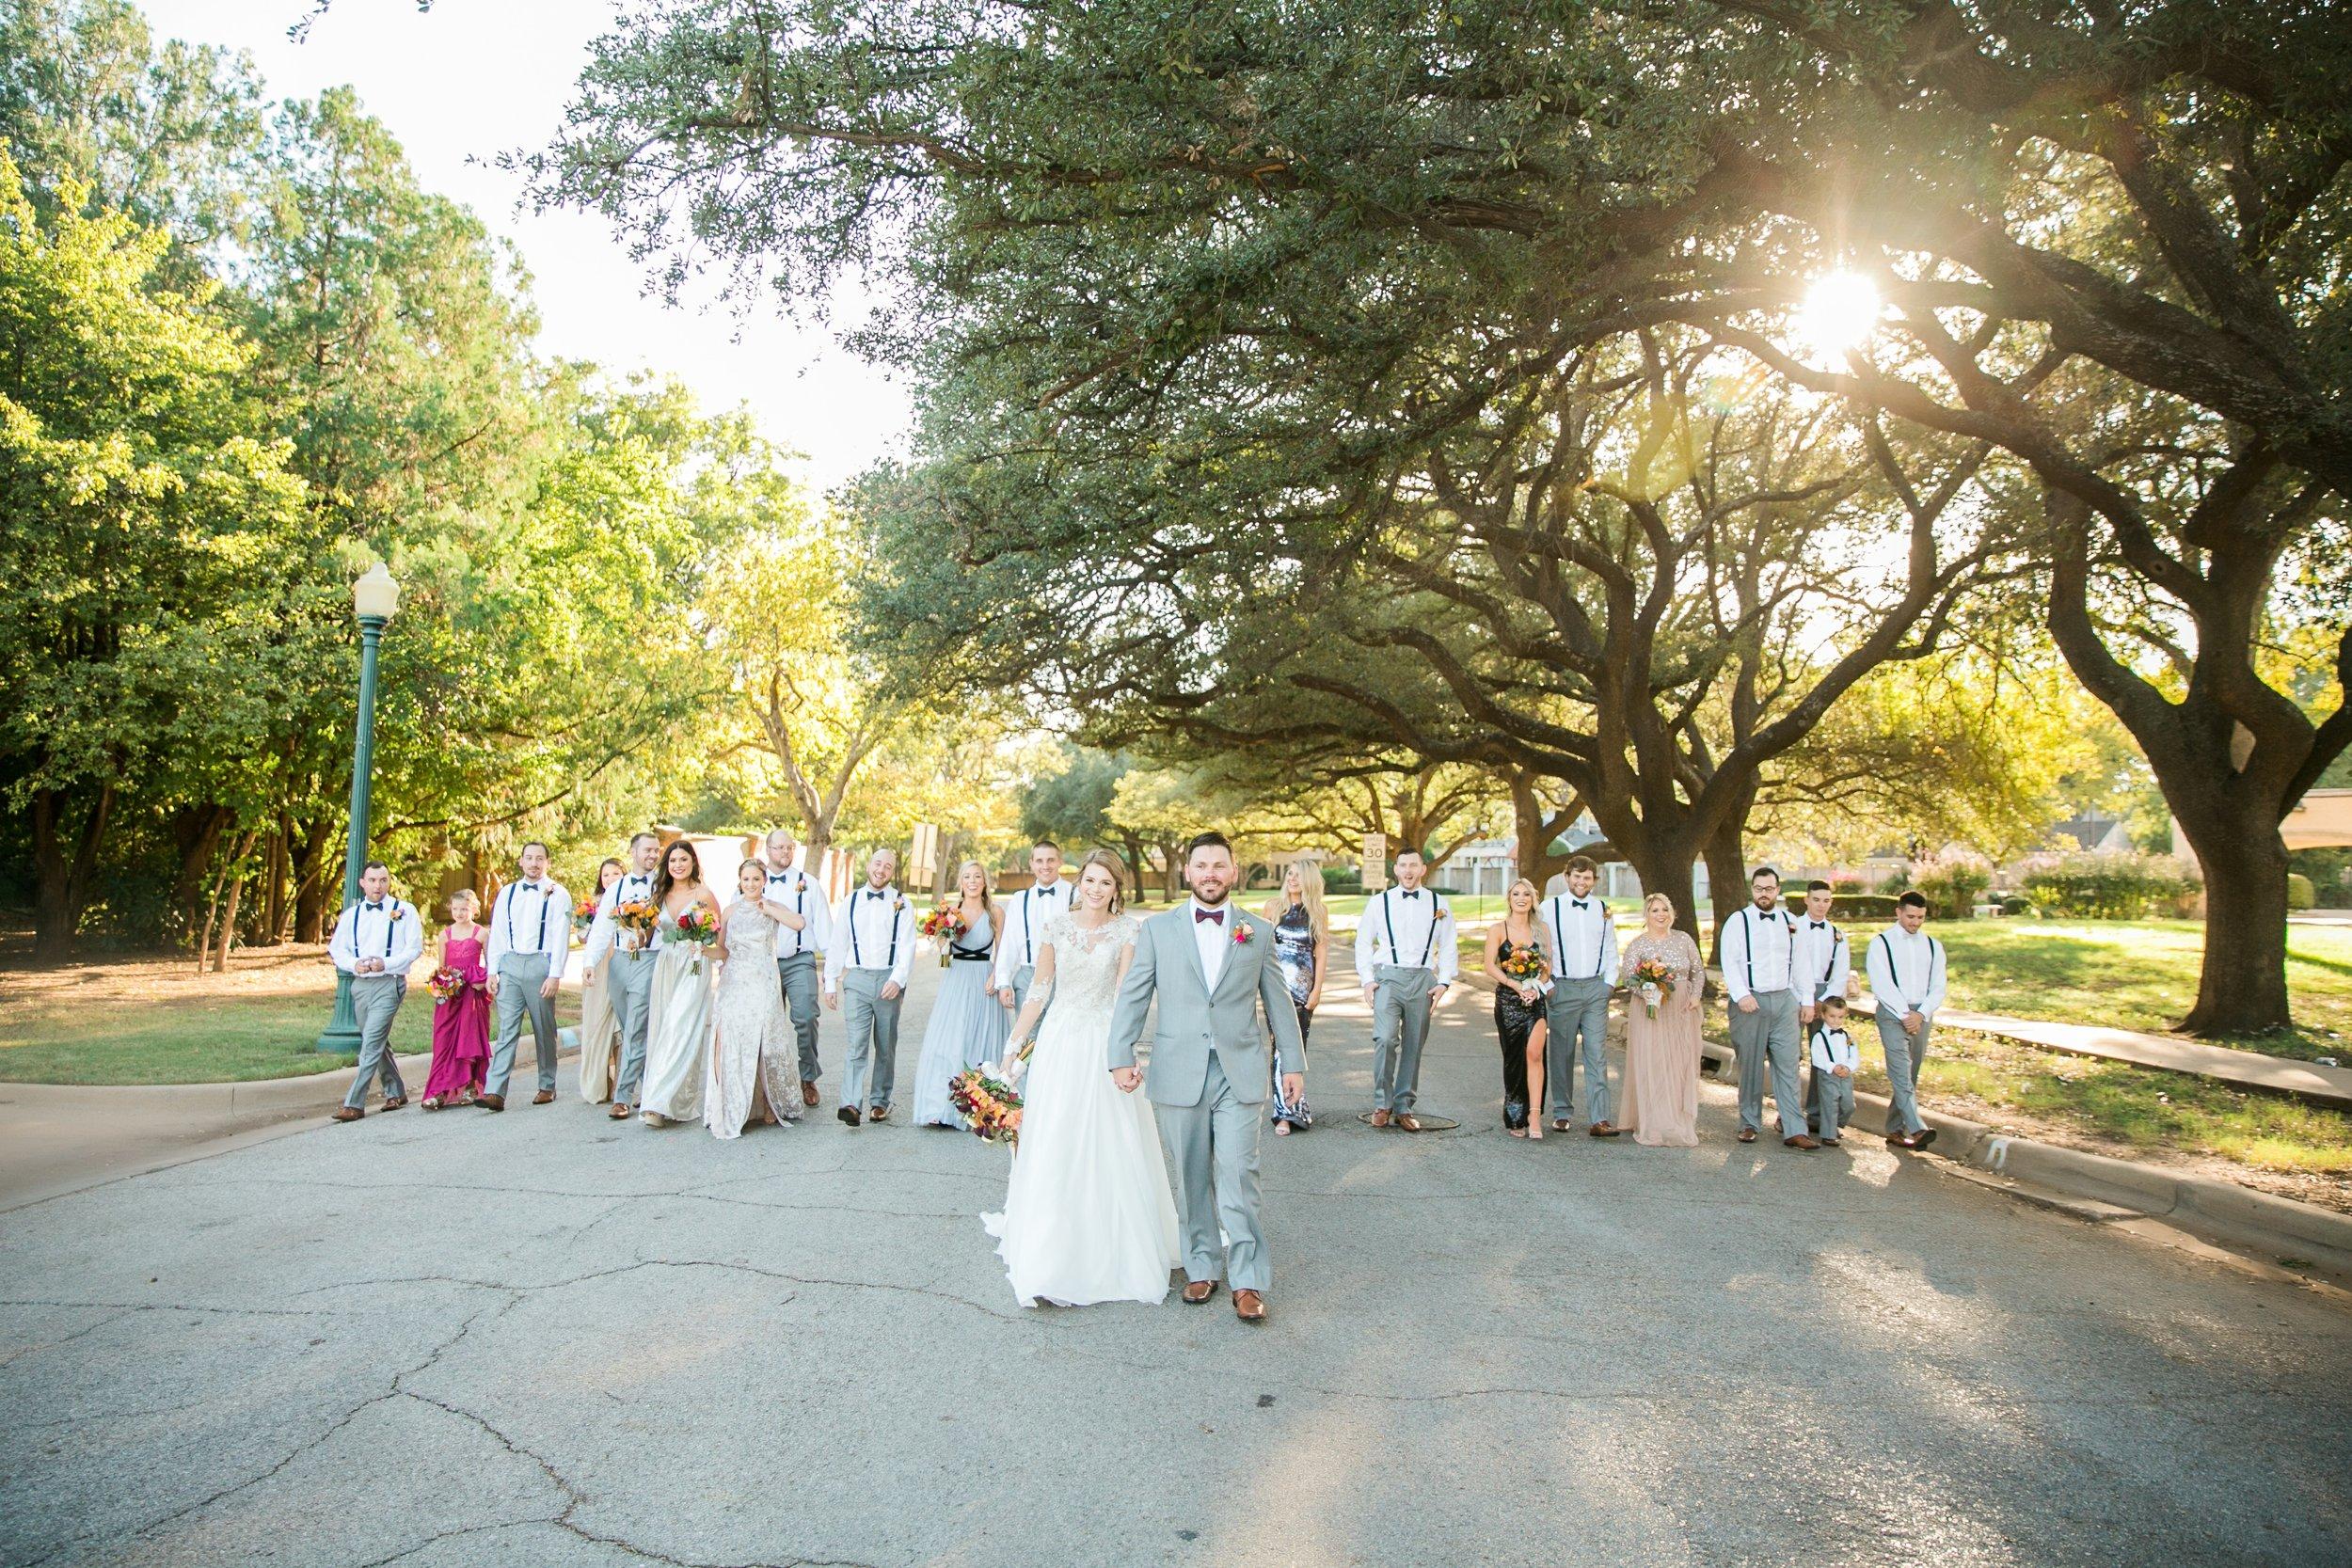 Roberson-Wedding-The-Forum-Lauren-Pinson-Wedding-Photography-Wichita-Falls-Texas-066.jpg